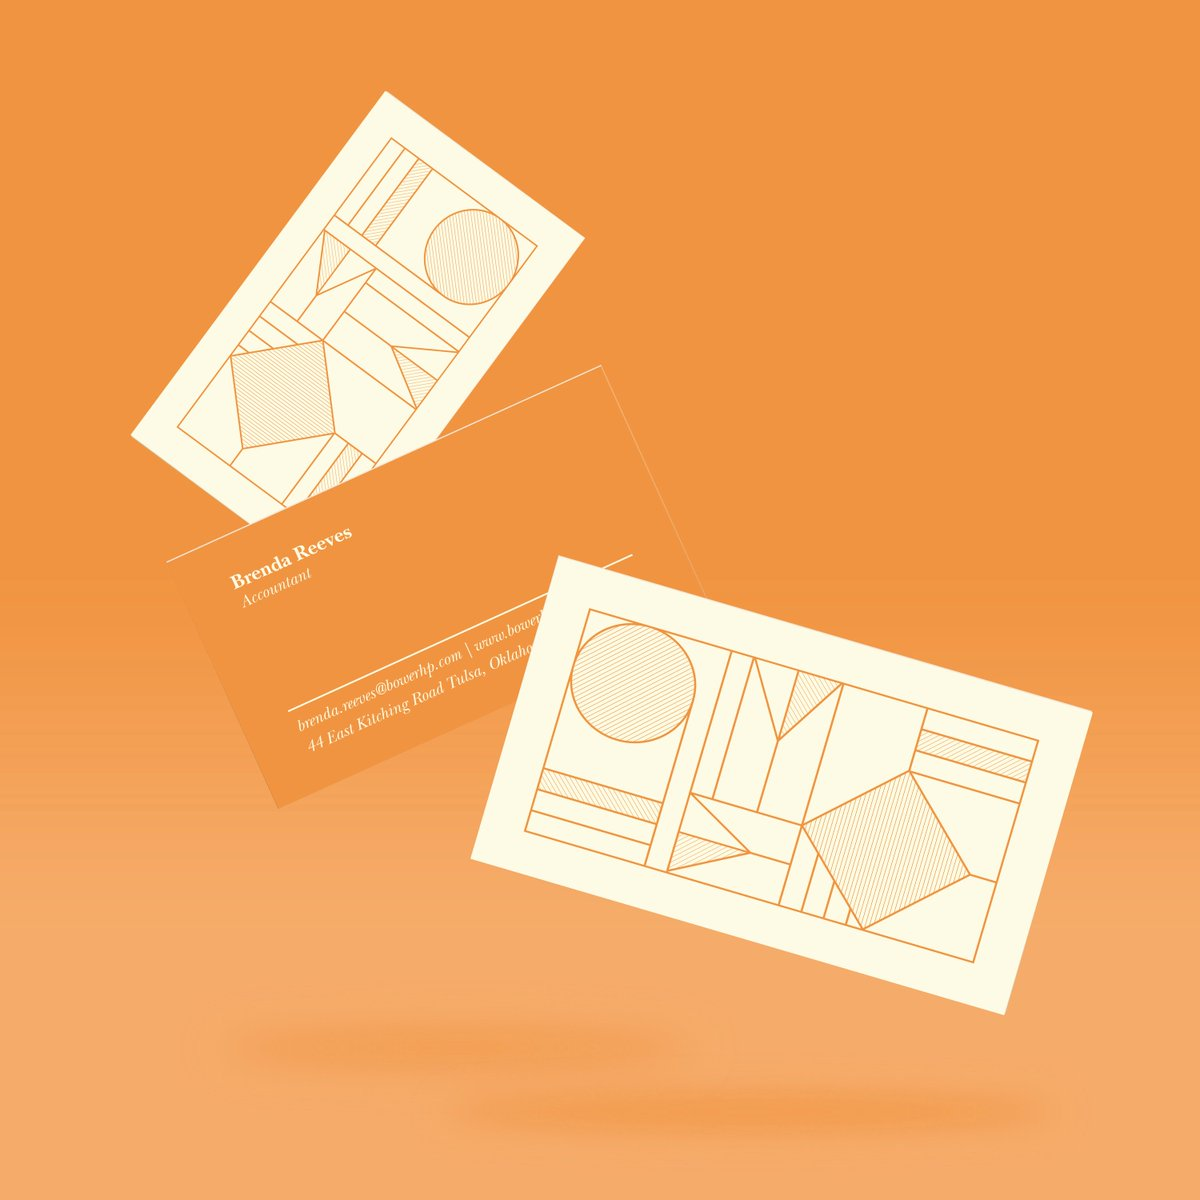 Businessprinting hashtag on twitter dsgnmark design print businesscard art lineart visualidentity graphicdesign designinspo businessprinting businessstationery branding art malvernweather Gallery